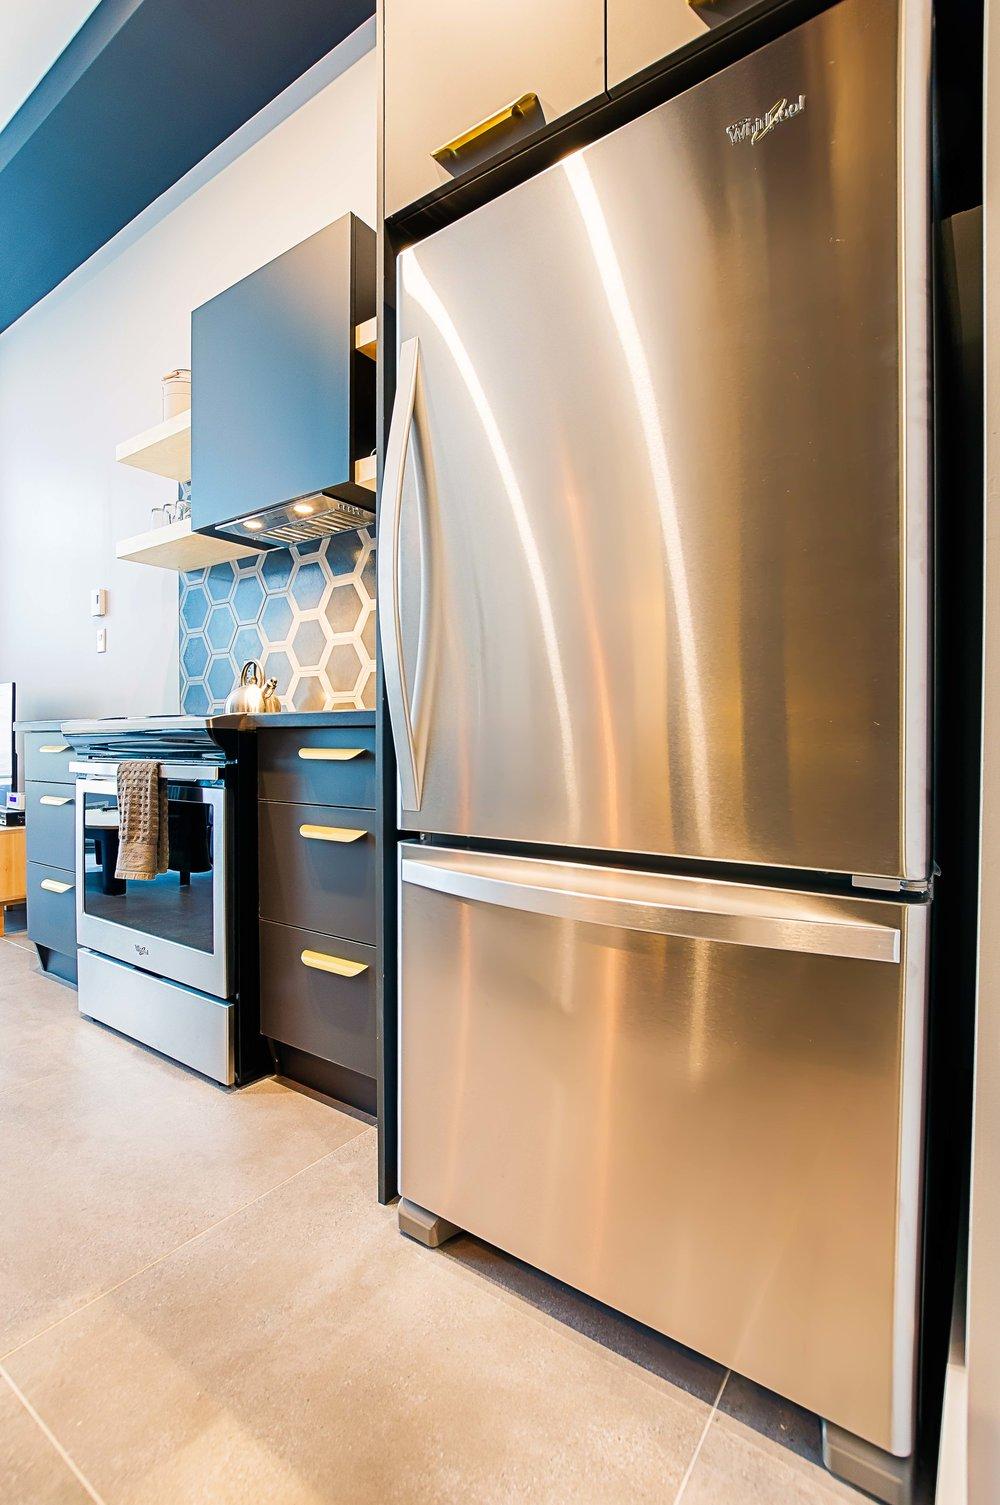 Complete Kitchen  FRIDGE, OVEN, MICROWAVE, COFFEE MACHIne, Dishwasher